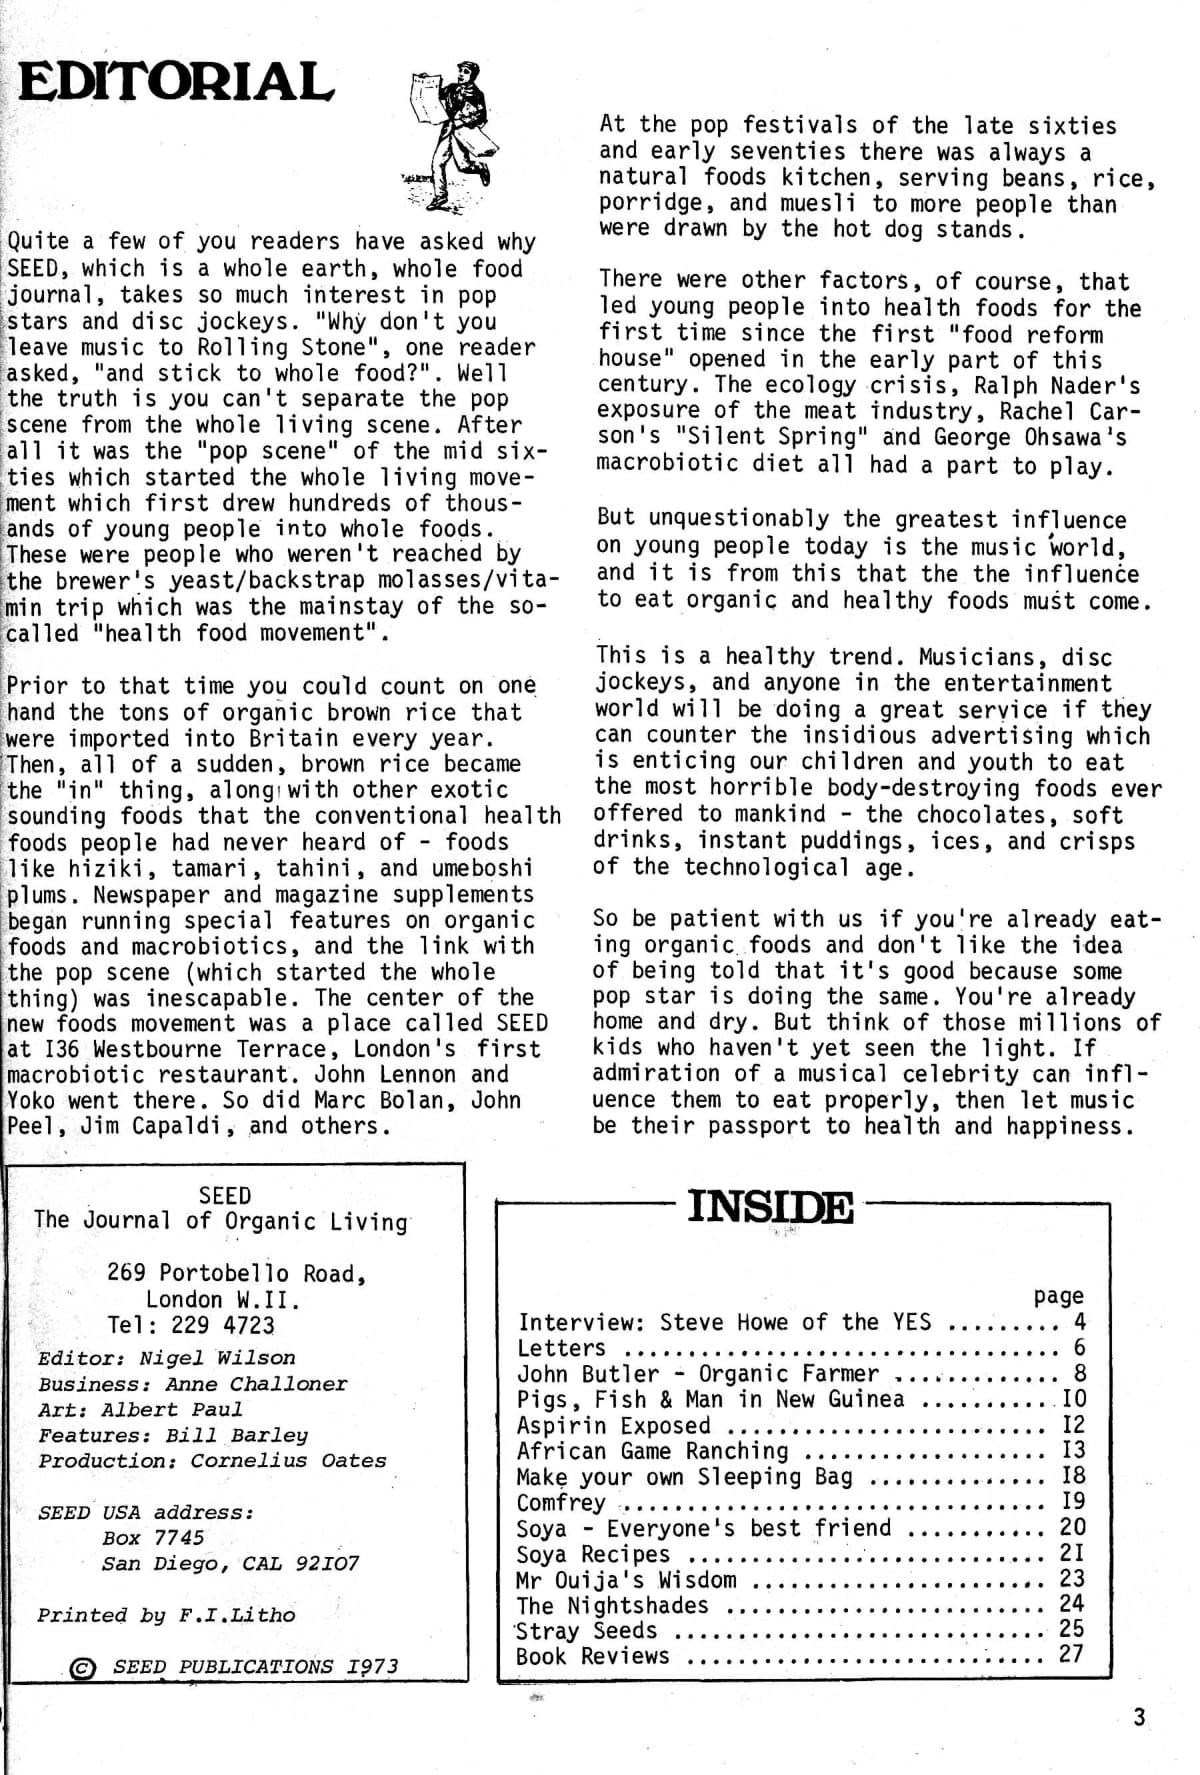 seed-v2-n6-june1973-03.jpg